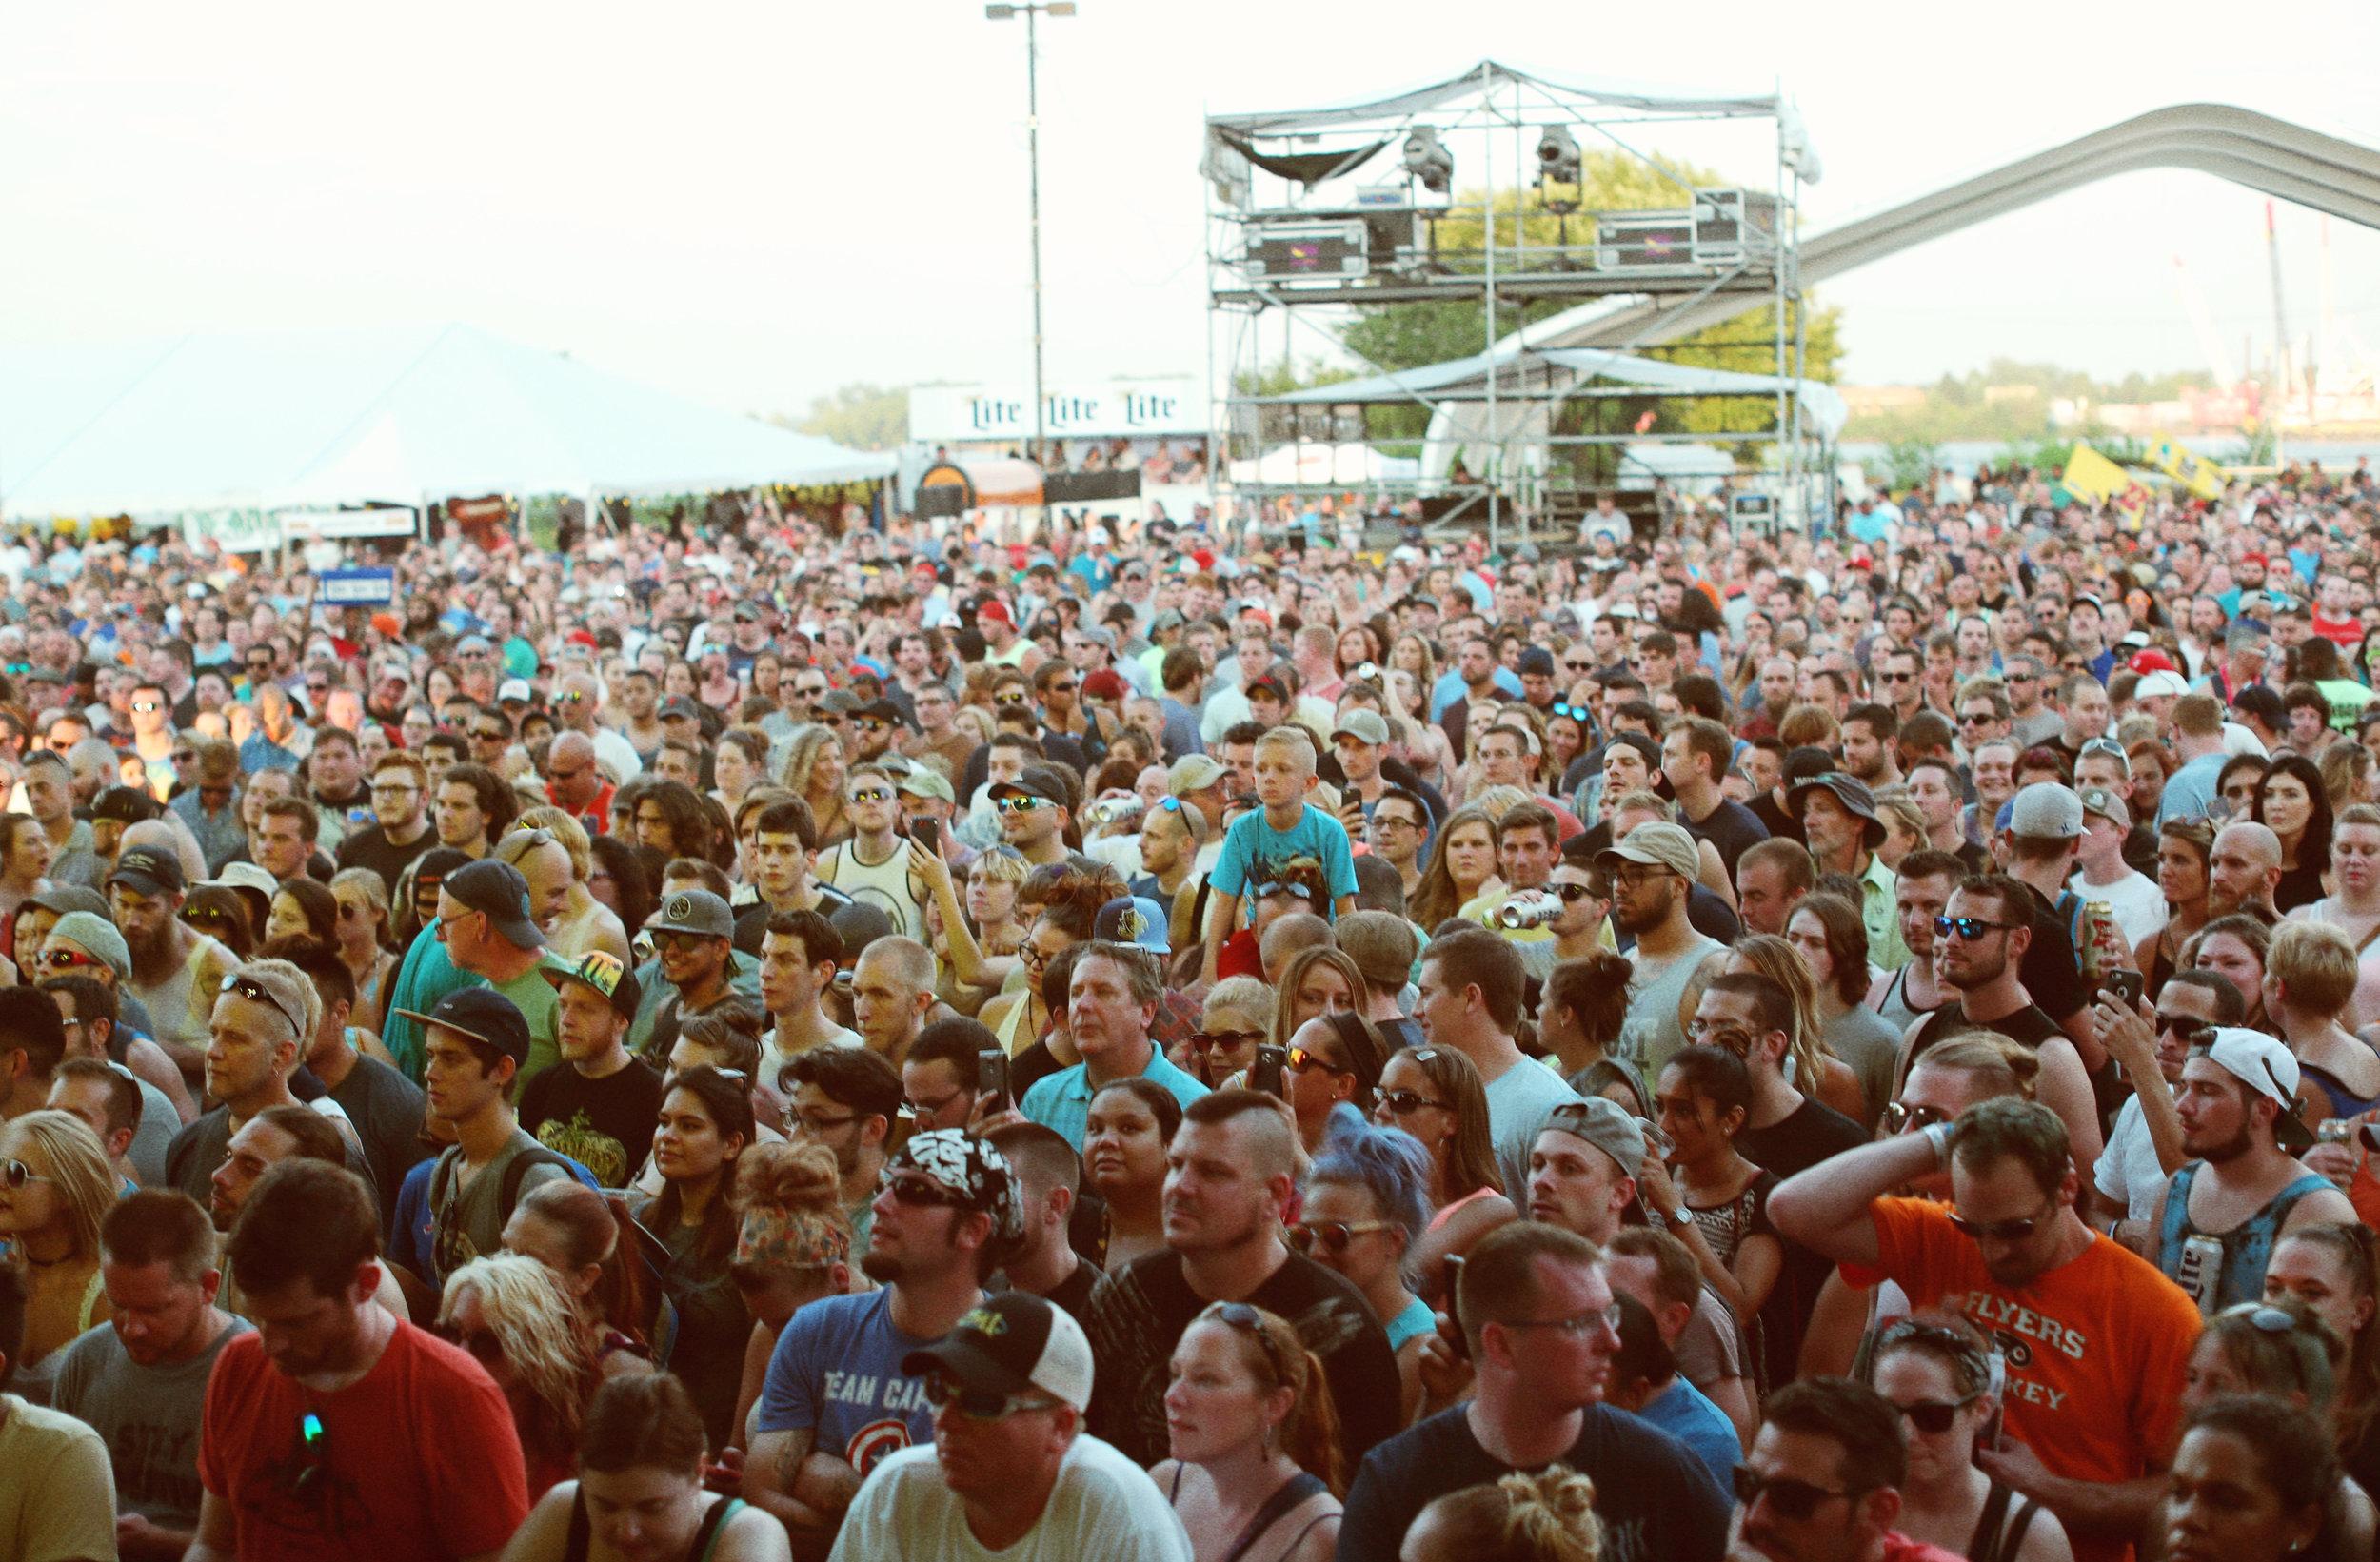 crowd sunshone.JPG